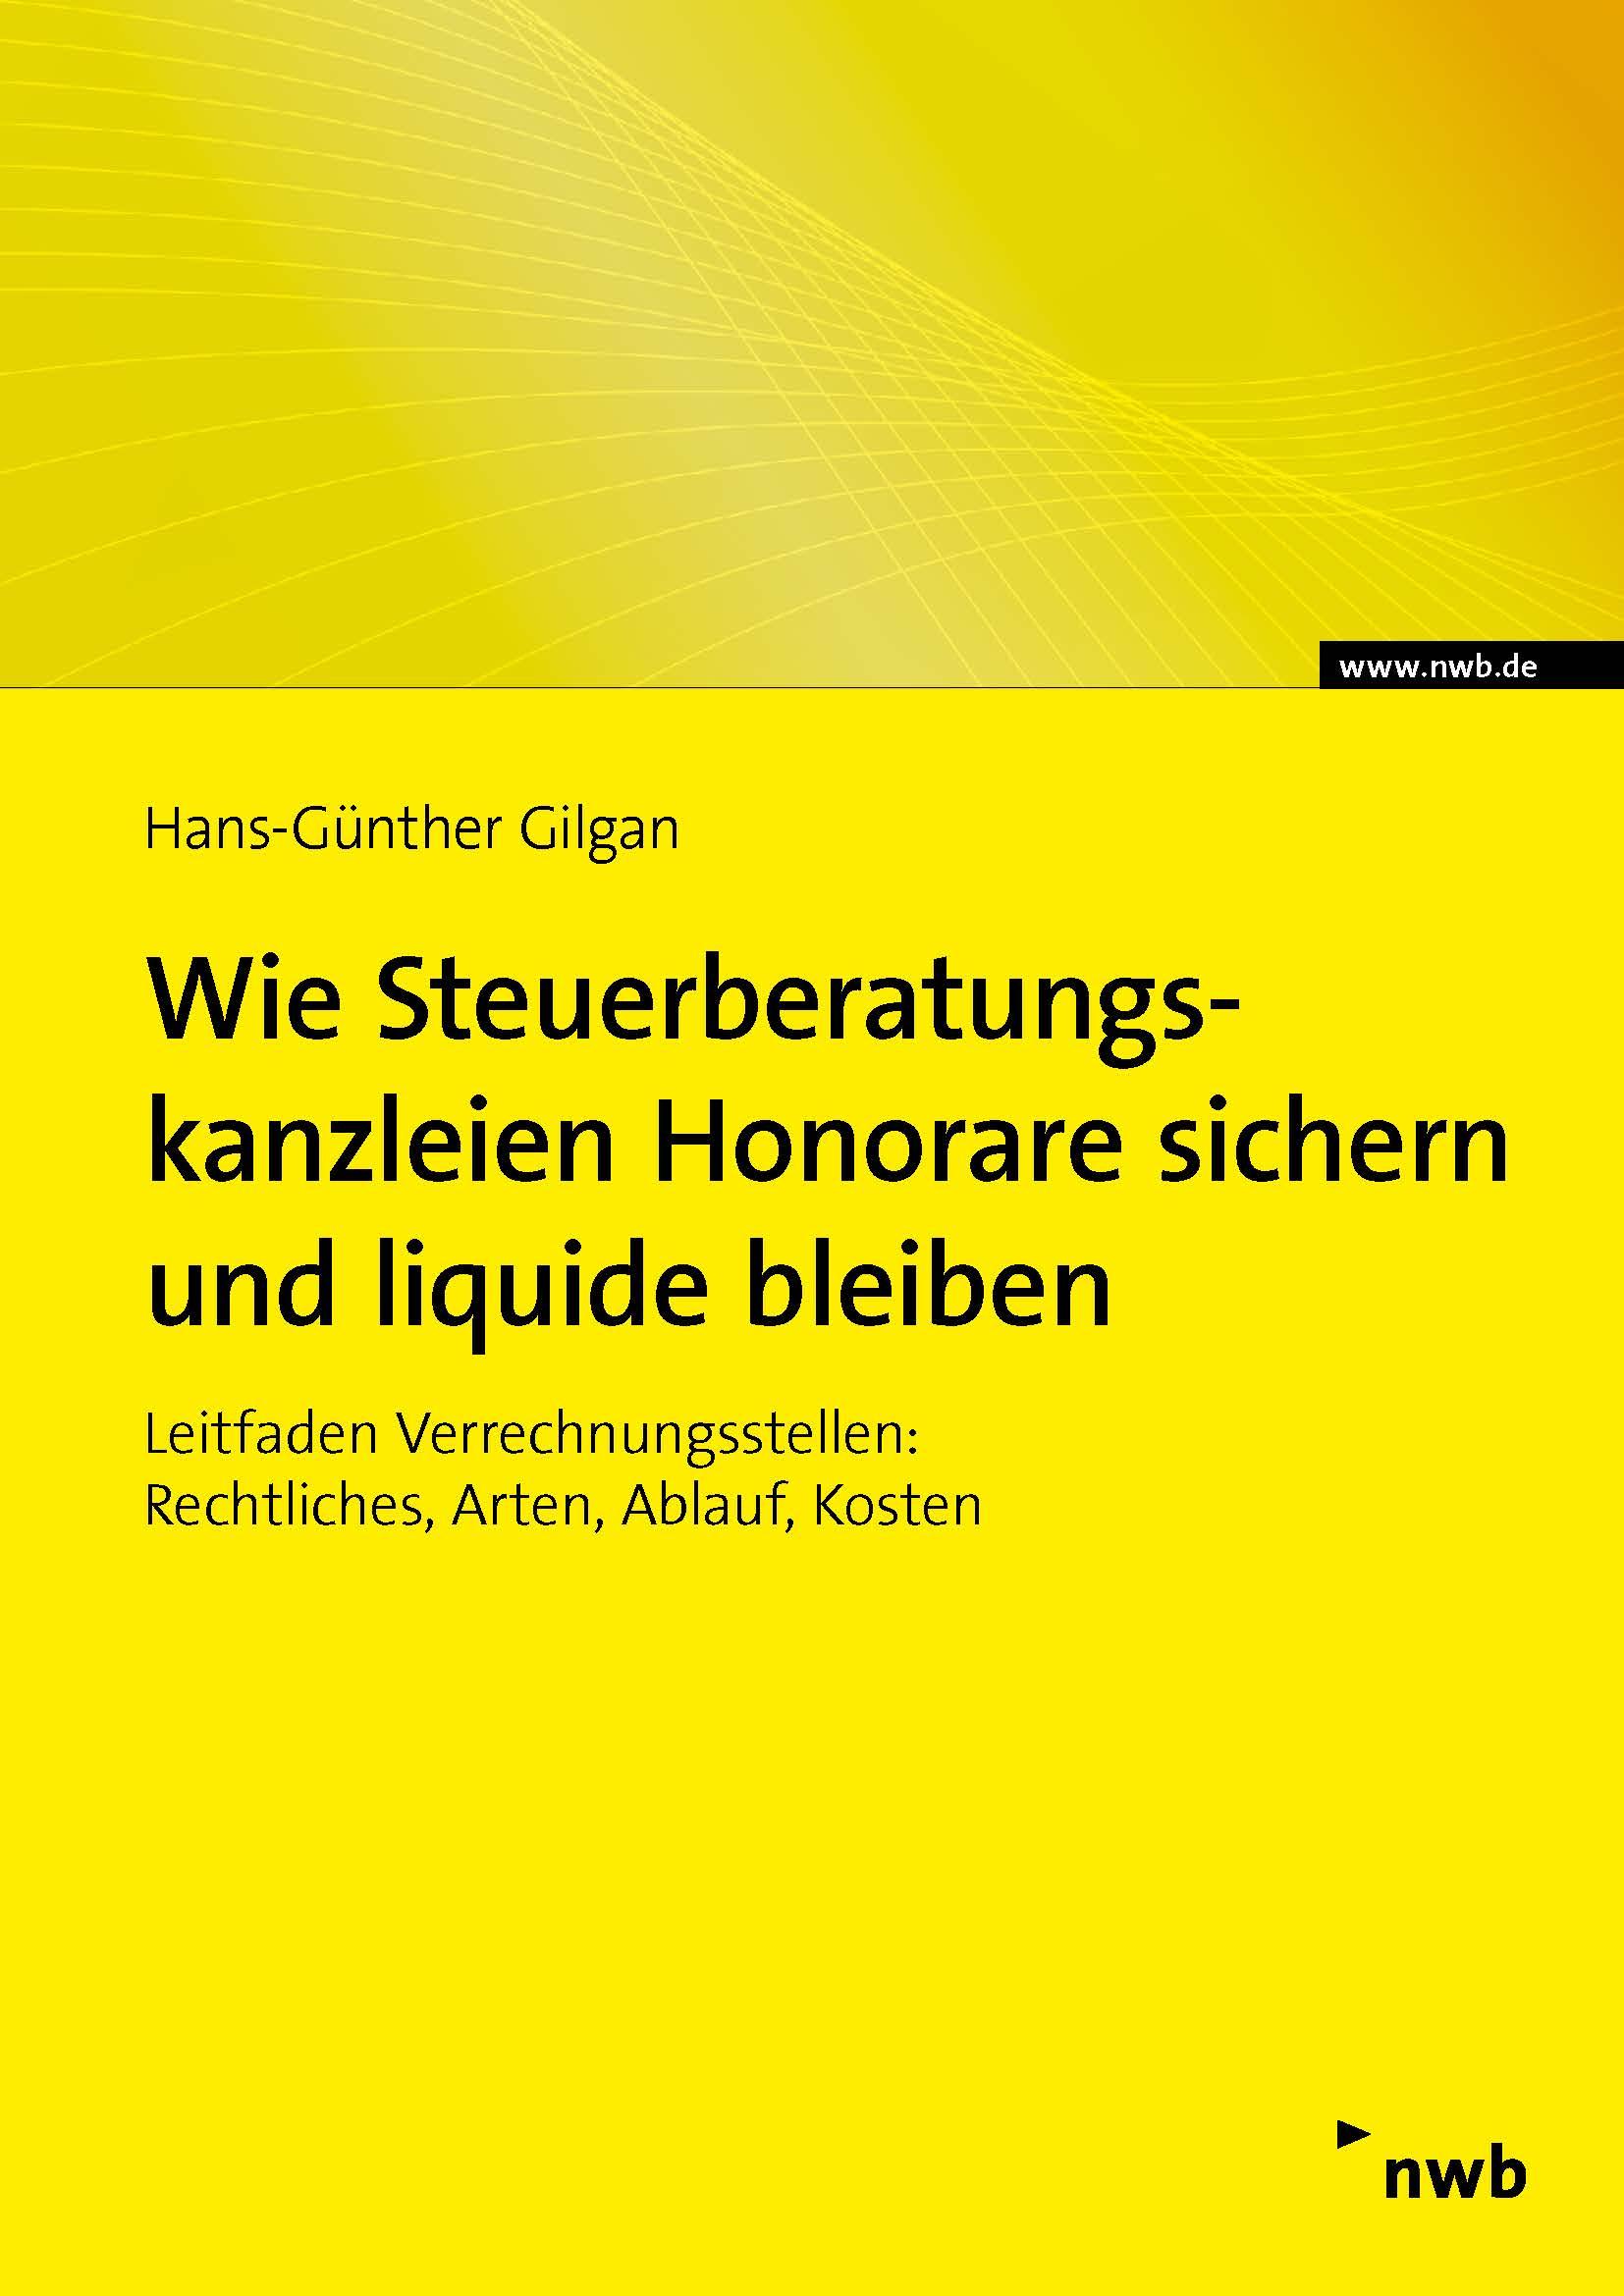 cover_eb_wie_steuerberatungskanzleien_honorare_sichern